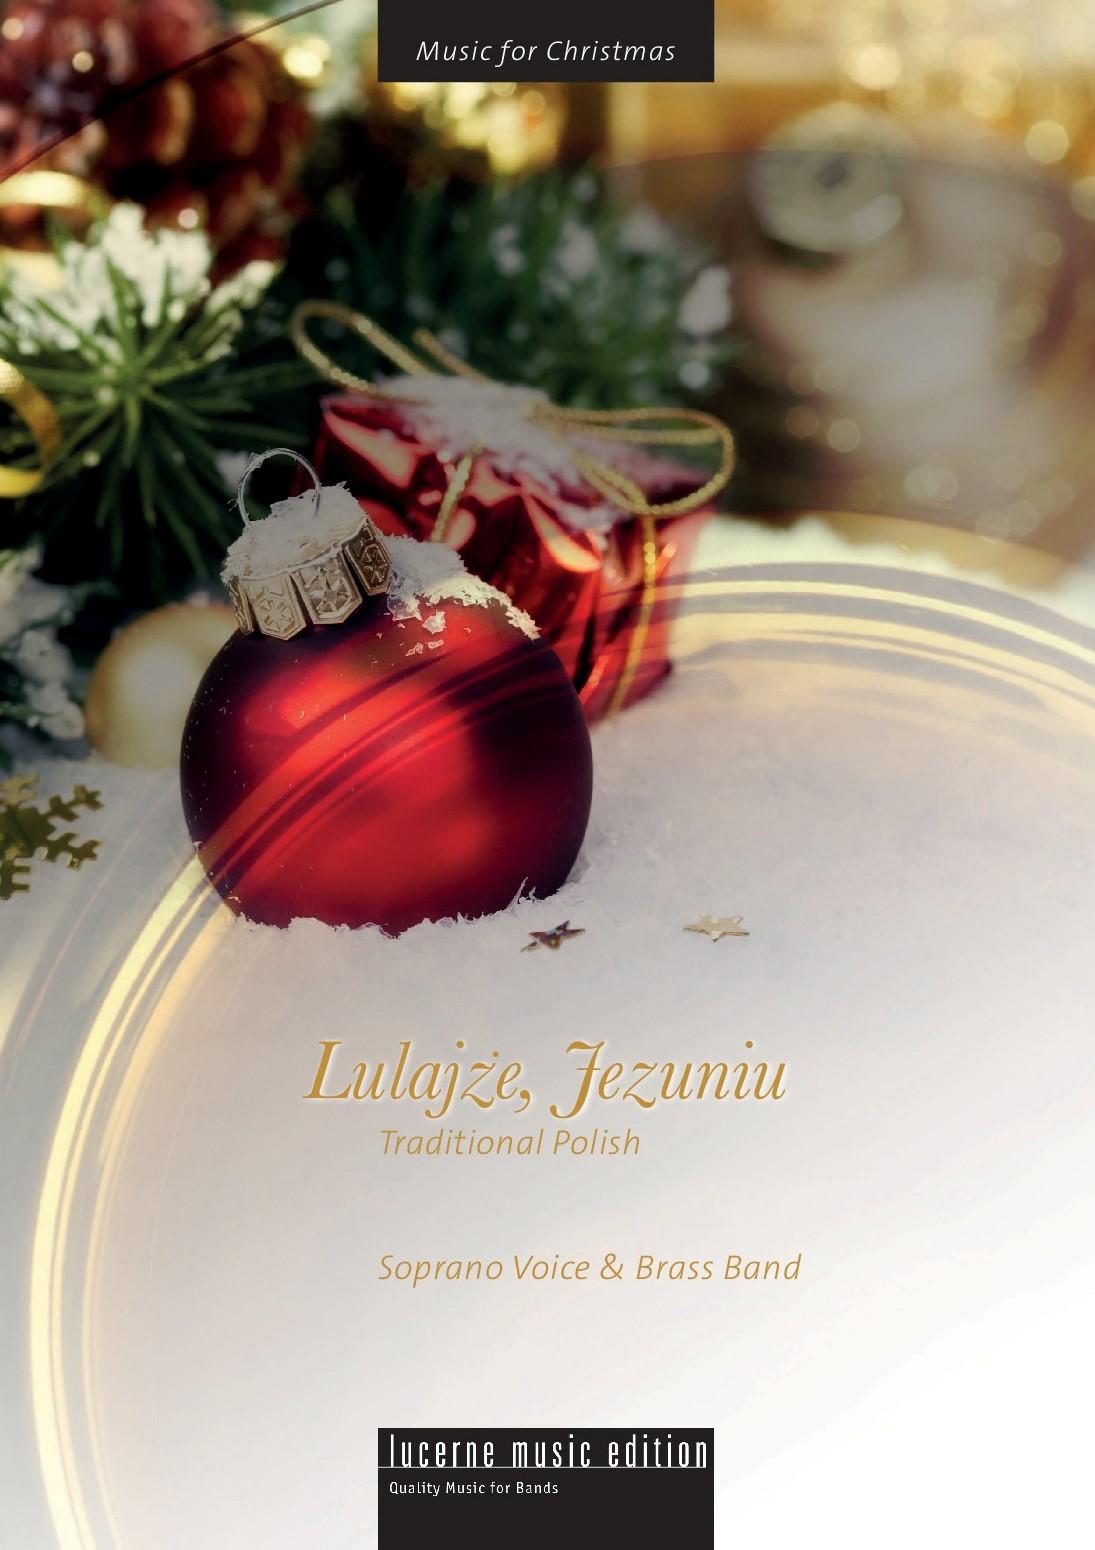 Lulajze, Jezuniu (Vocal Solo)